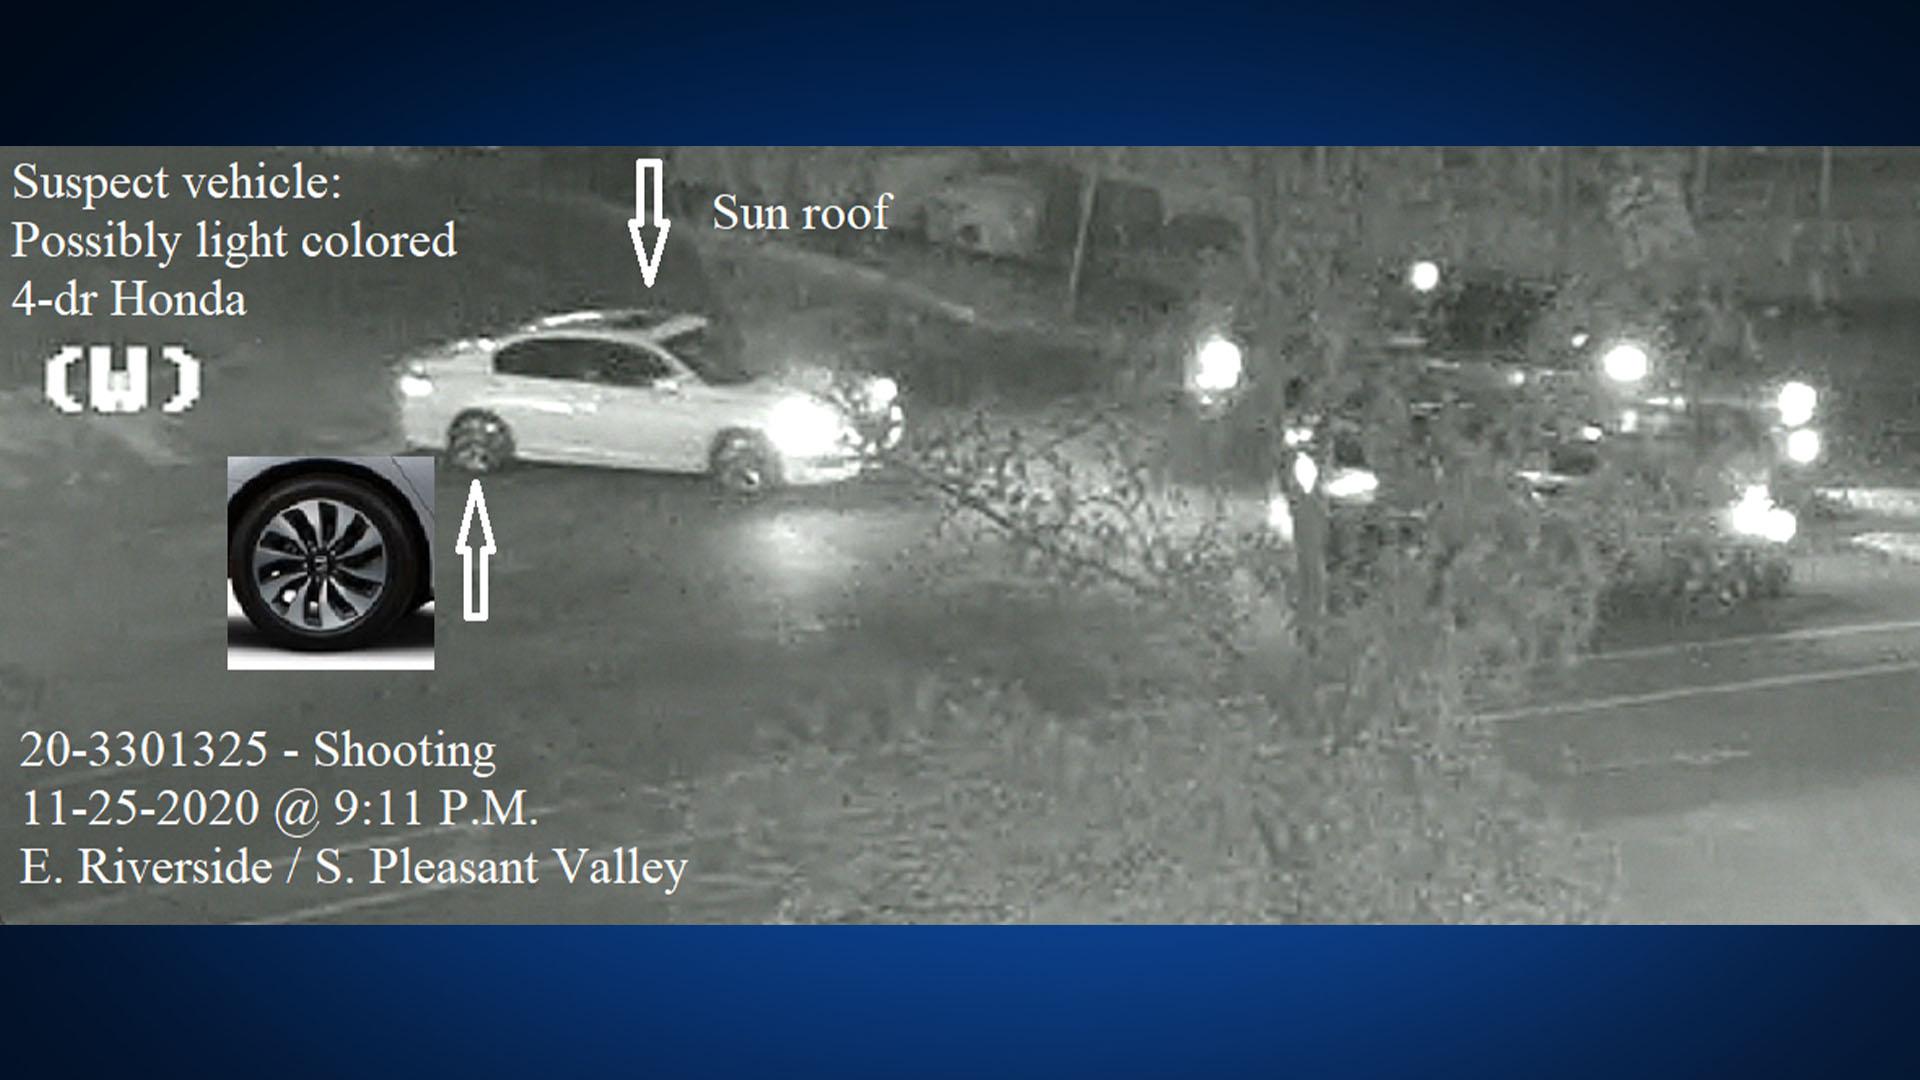 Car of suspect accused in Nov. 25 road rage incident (APD Photo)